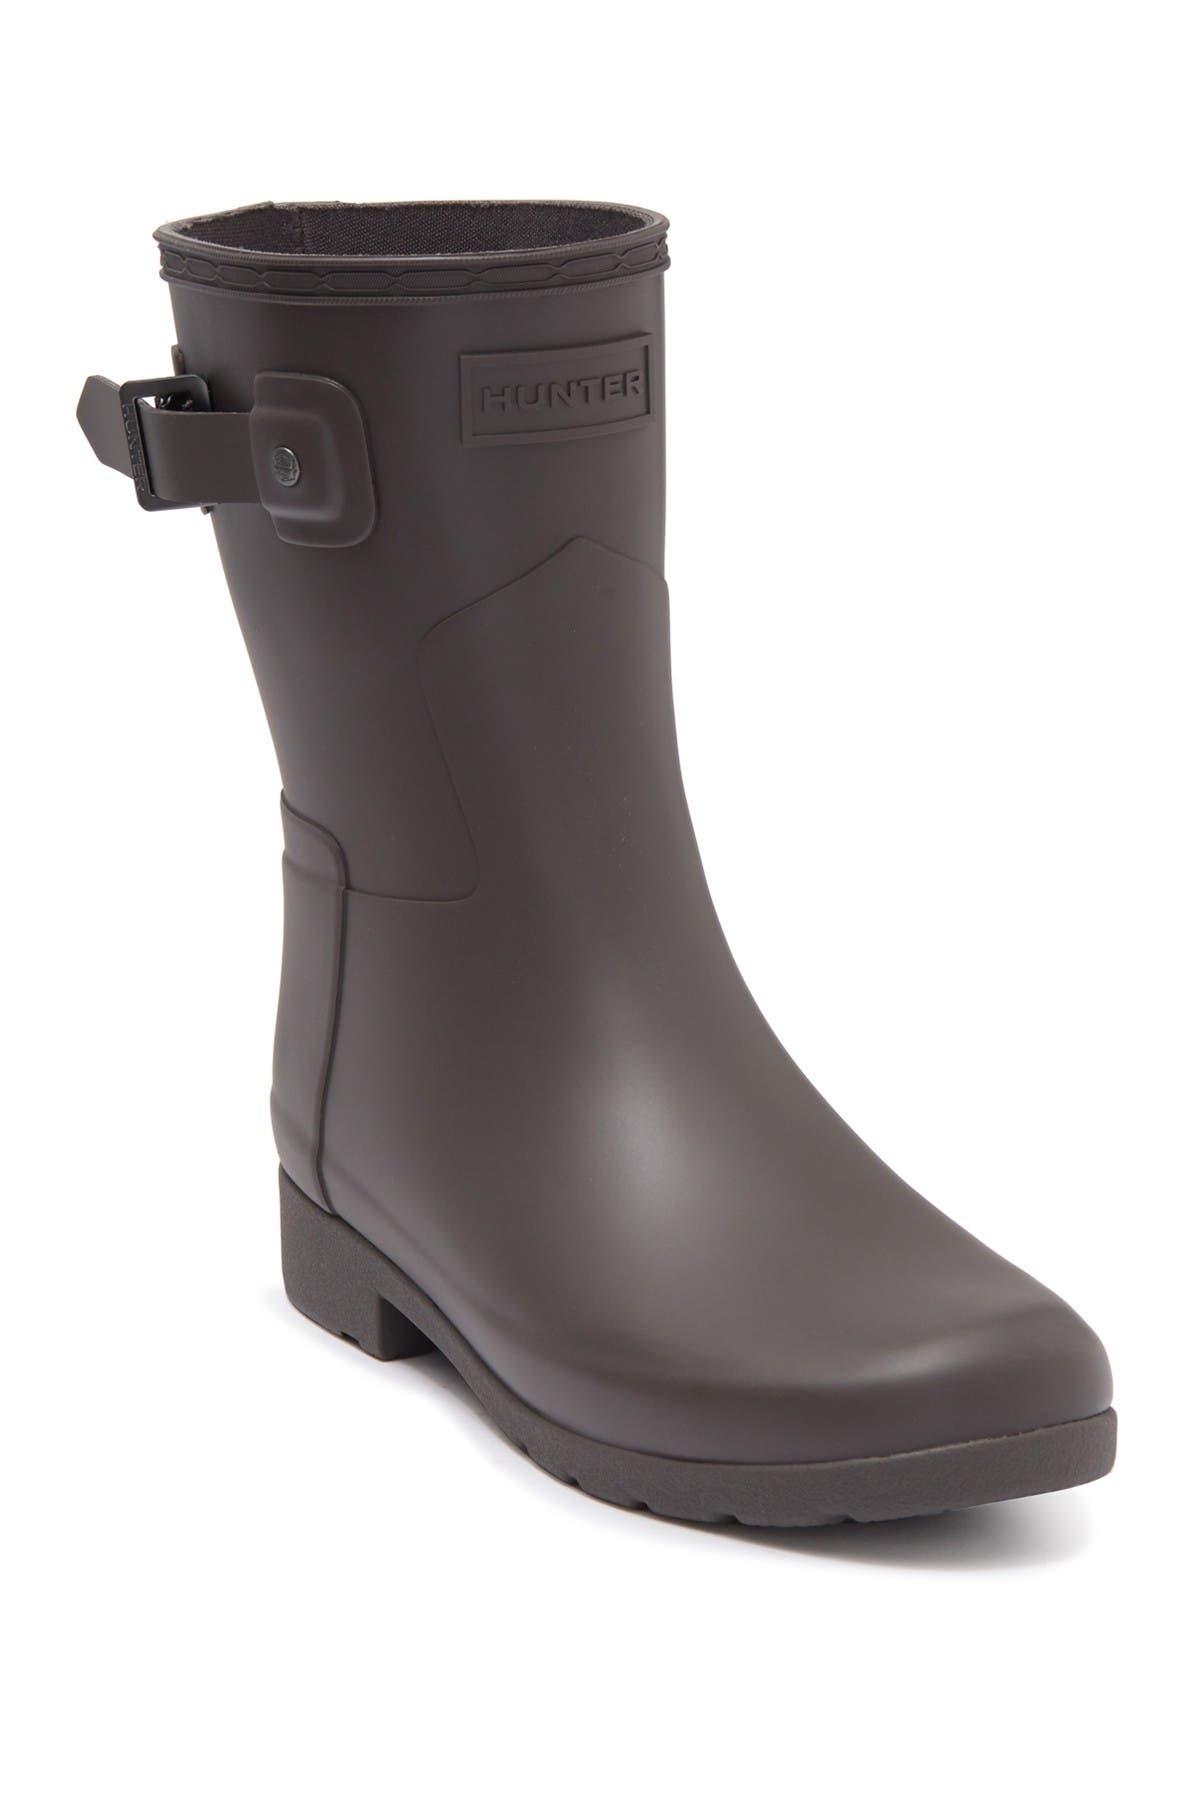 Image of Hunter Original Refined Short Waterproof Rain Boot